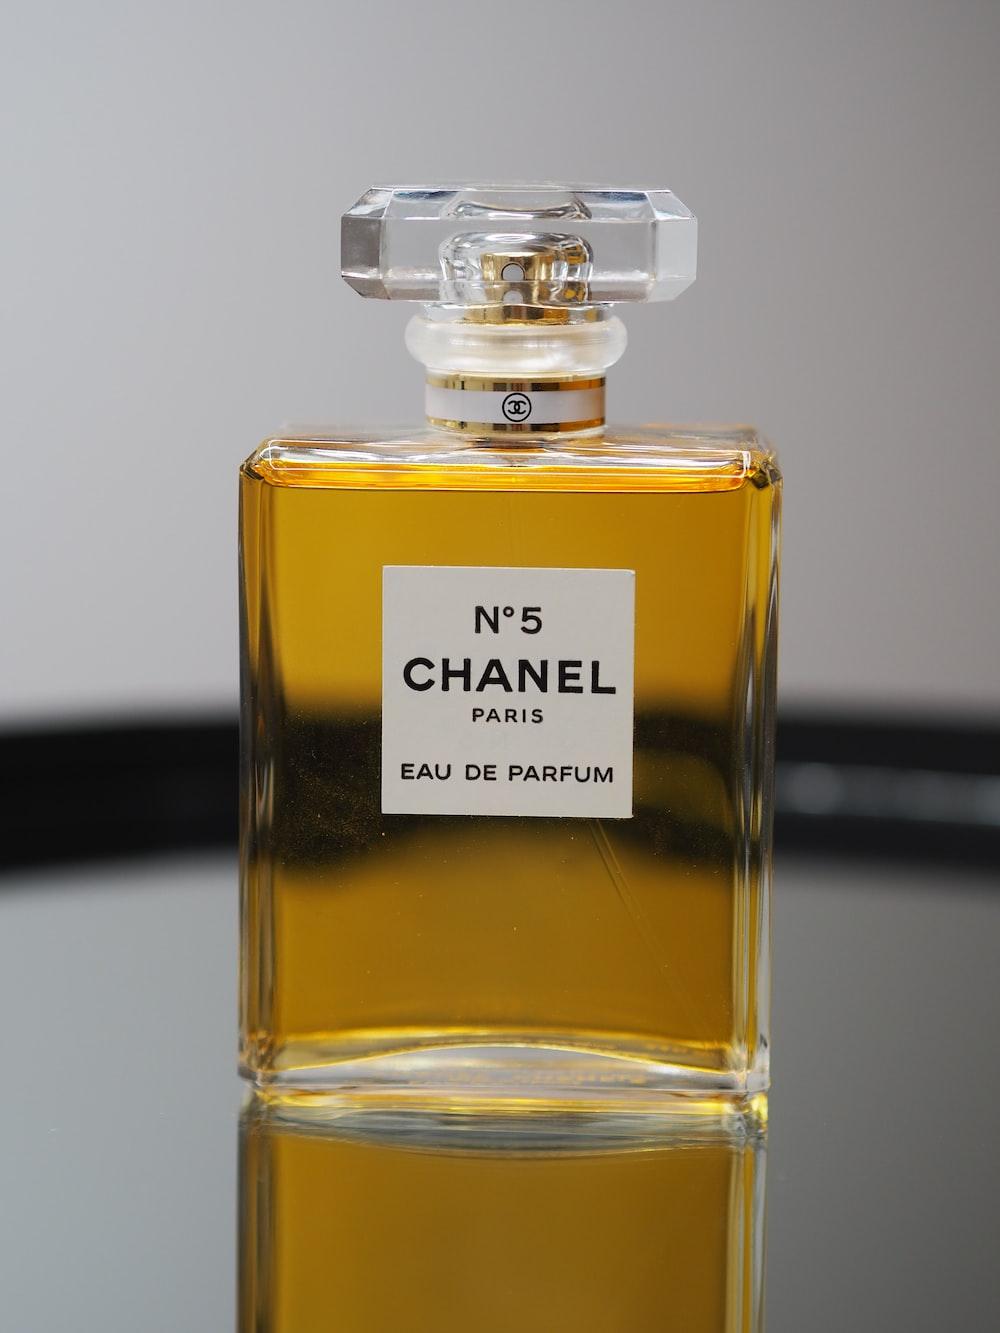 no 5 chanel no 5 eau de parfum